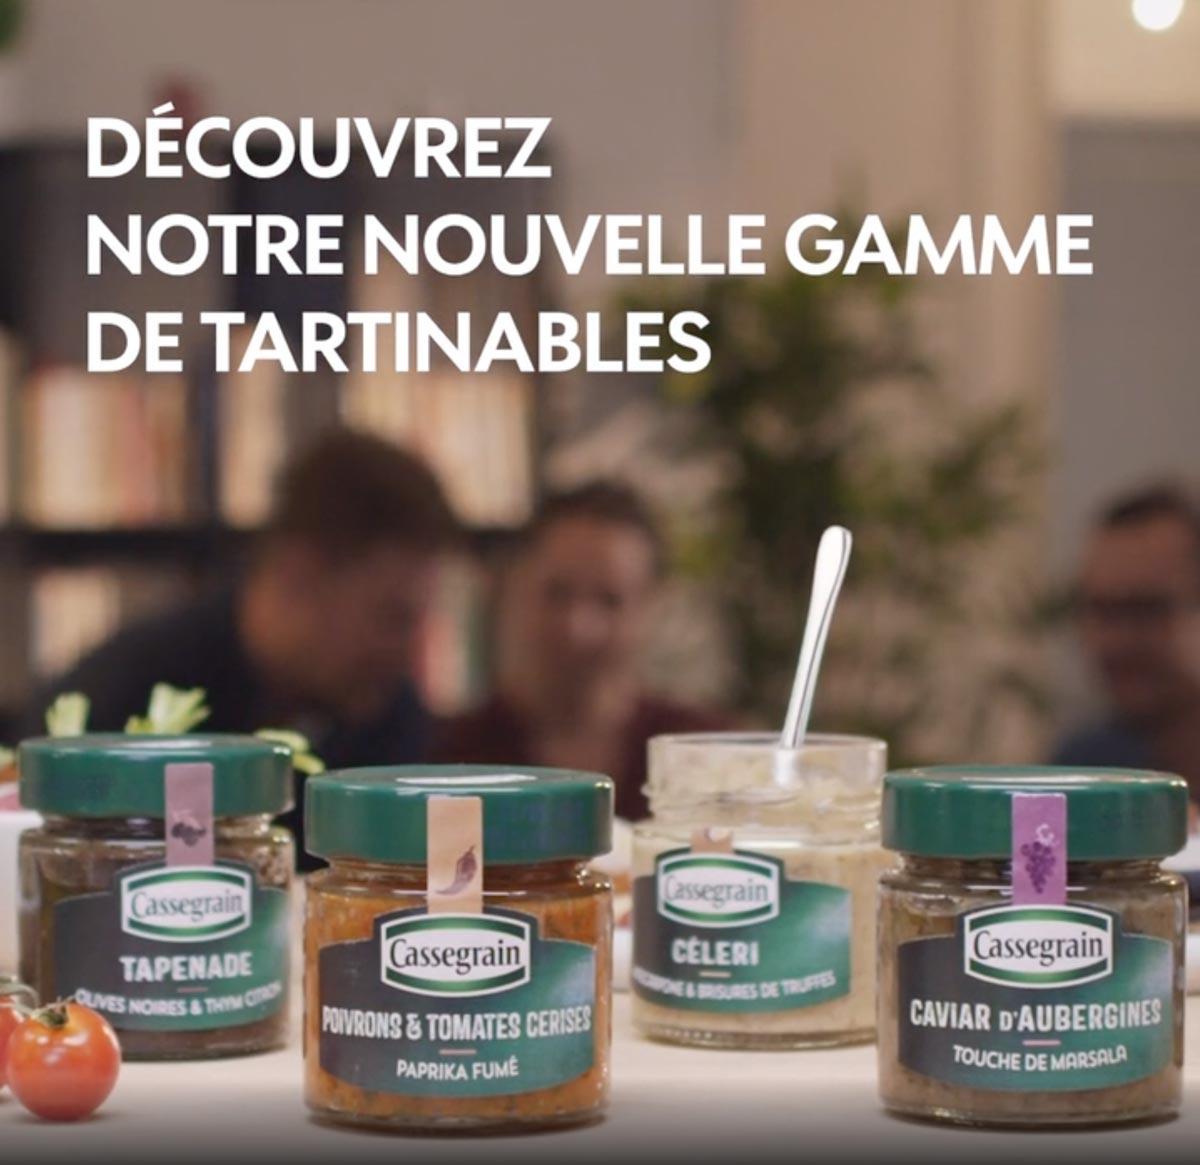 Cassegrain – Les tartinables